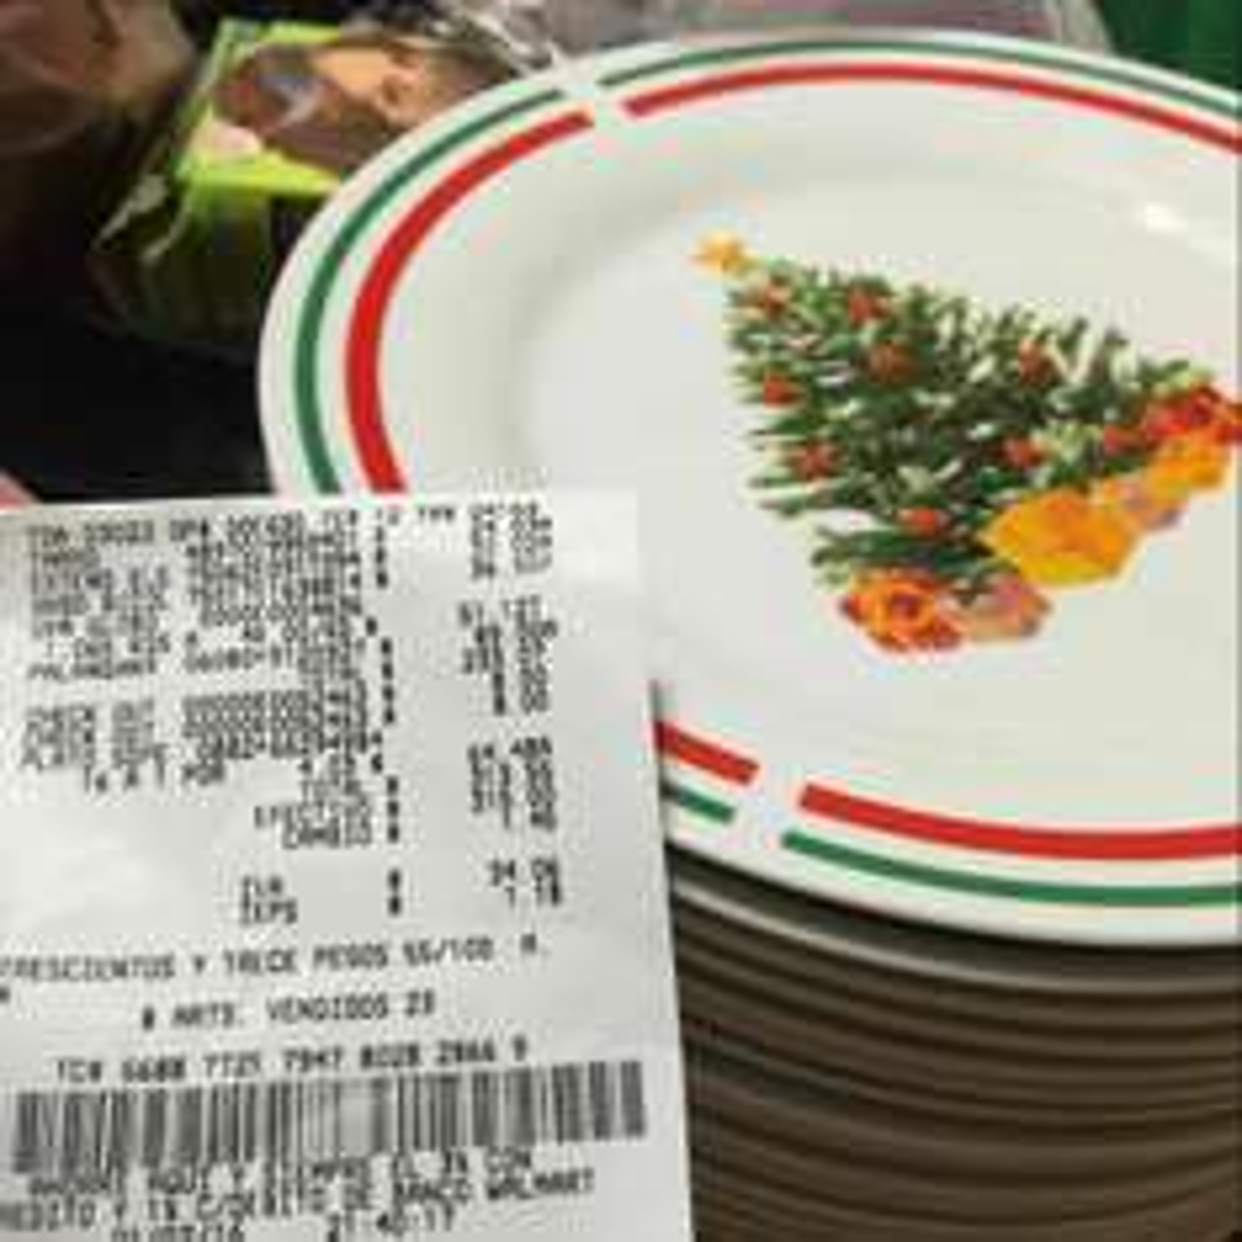 Bodega Aurrerá: Plato navideño a $4.03 pesos